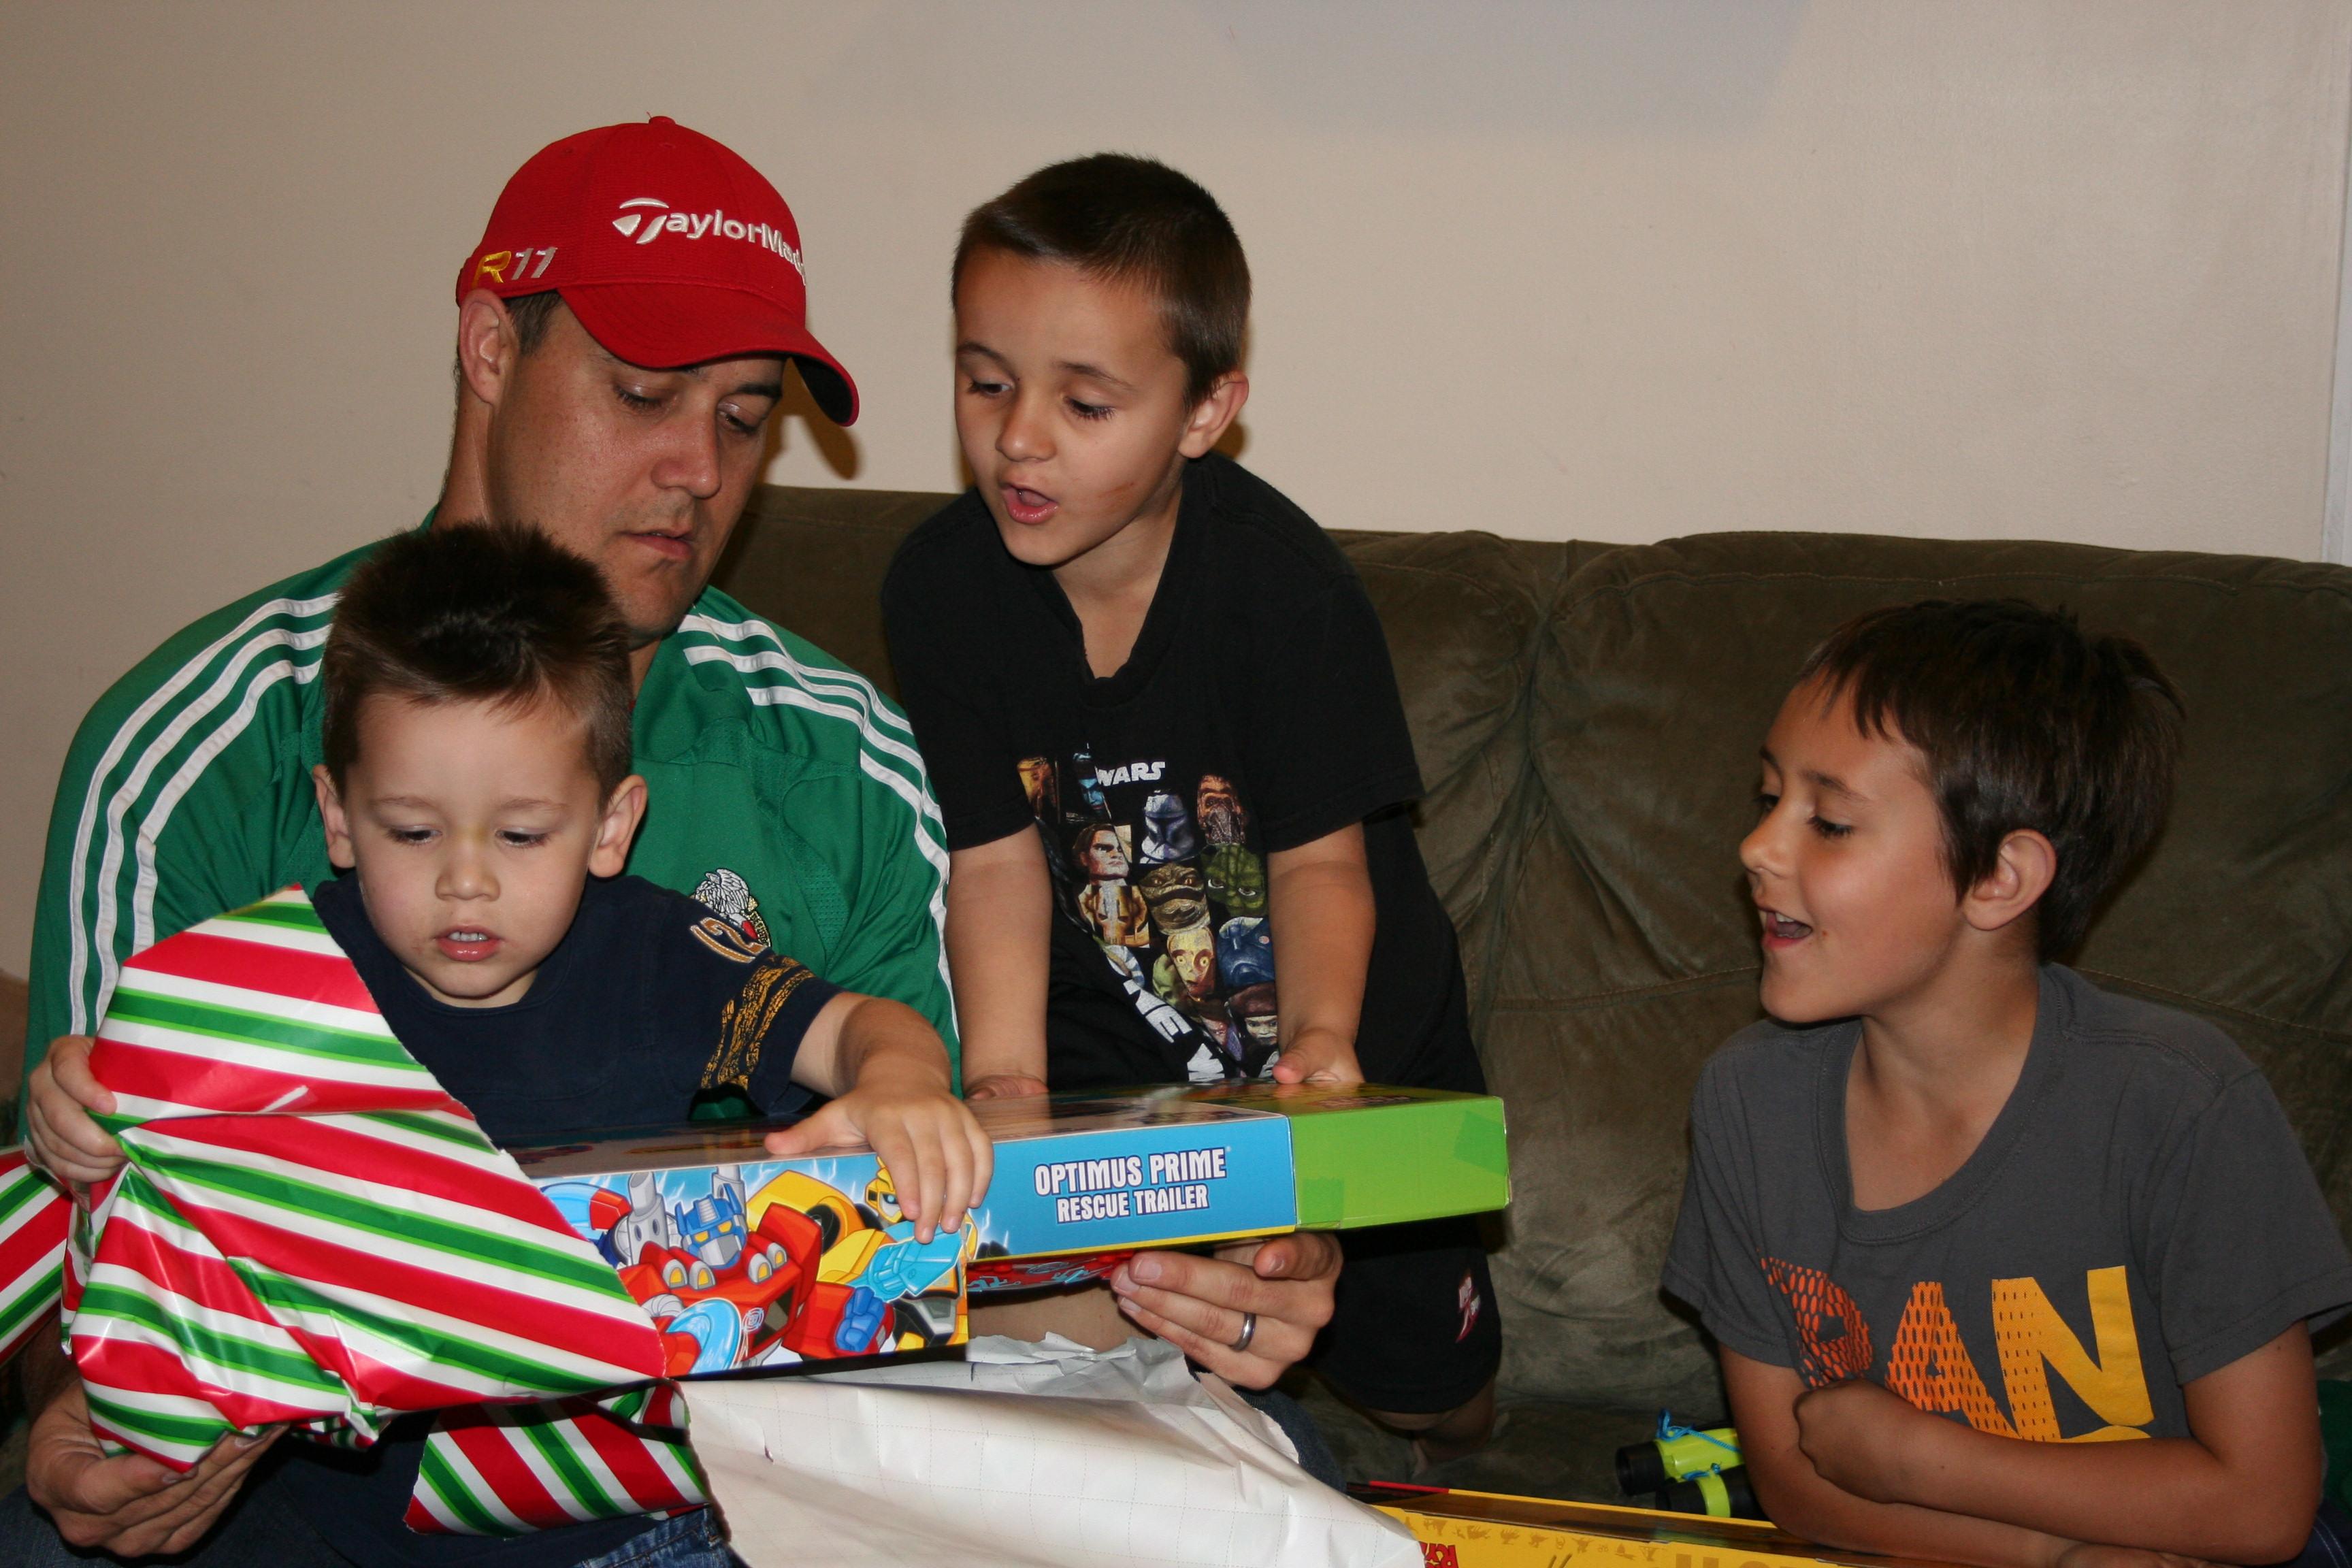 4 boys present